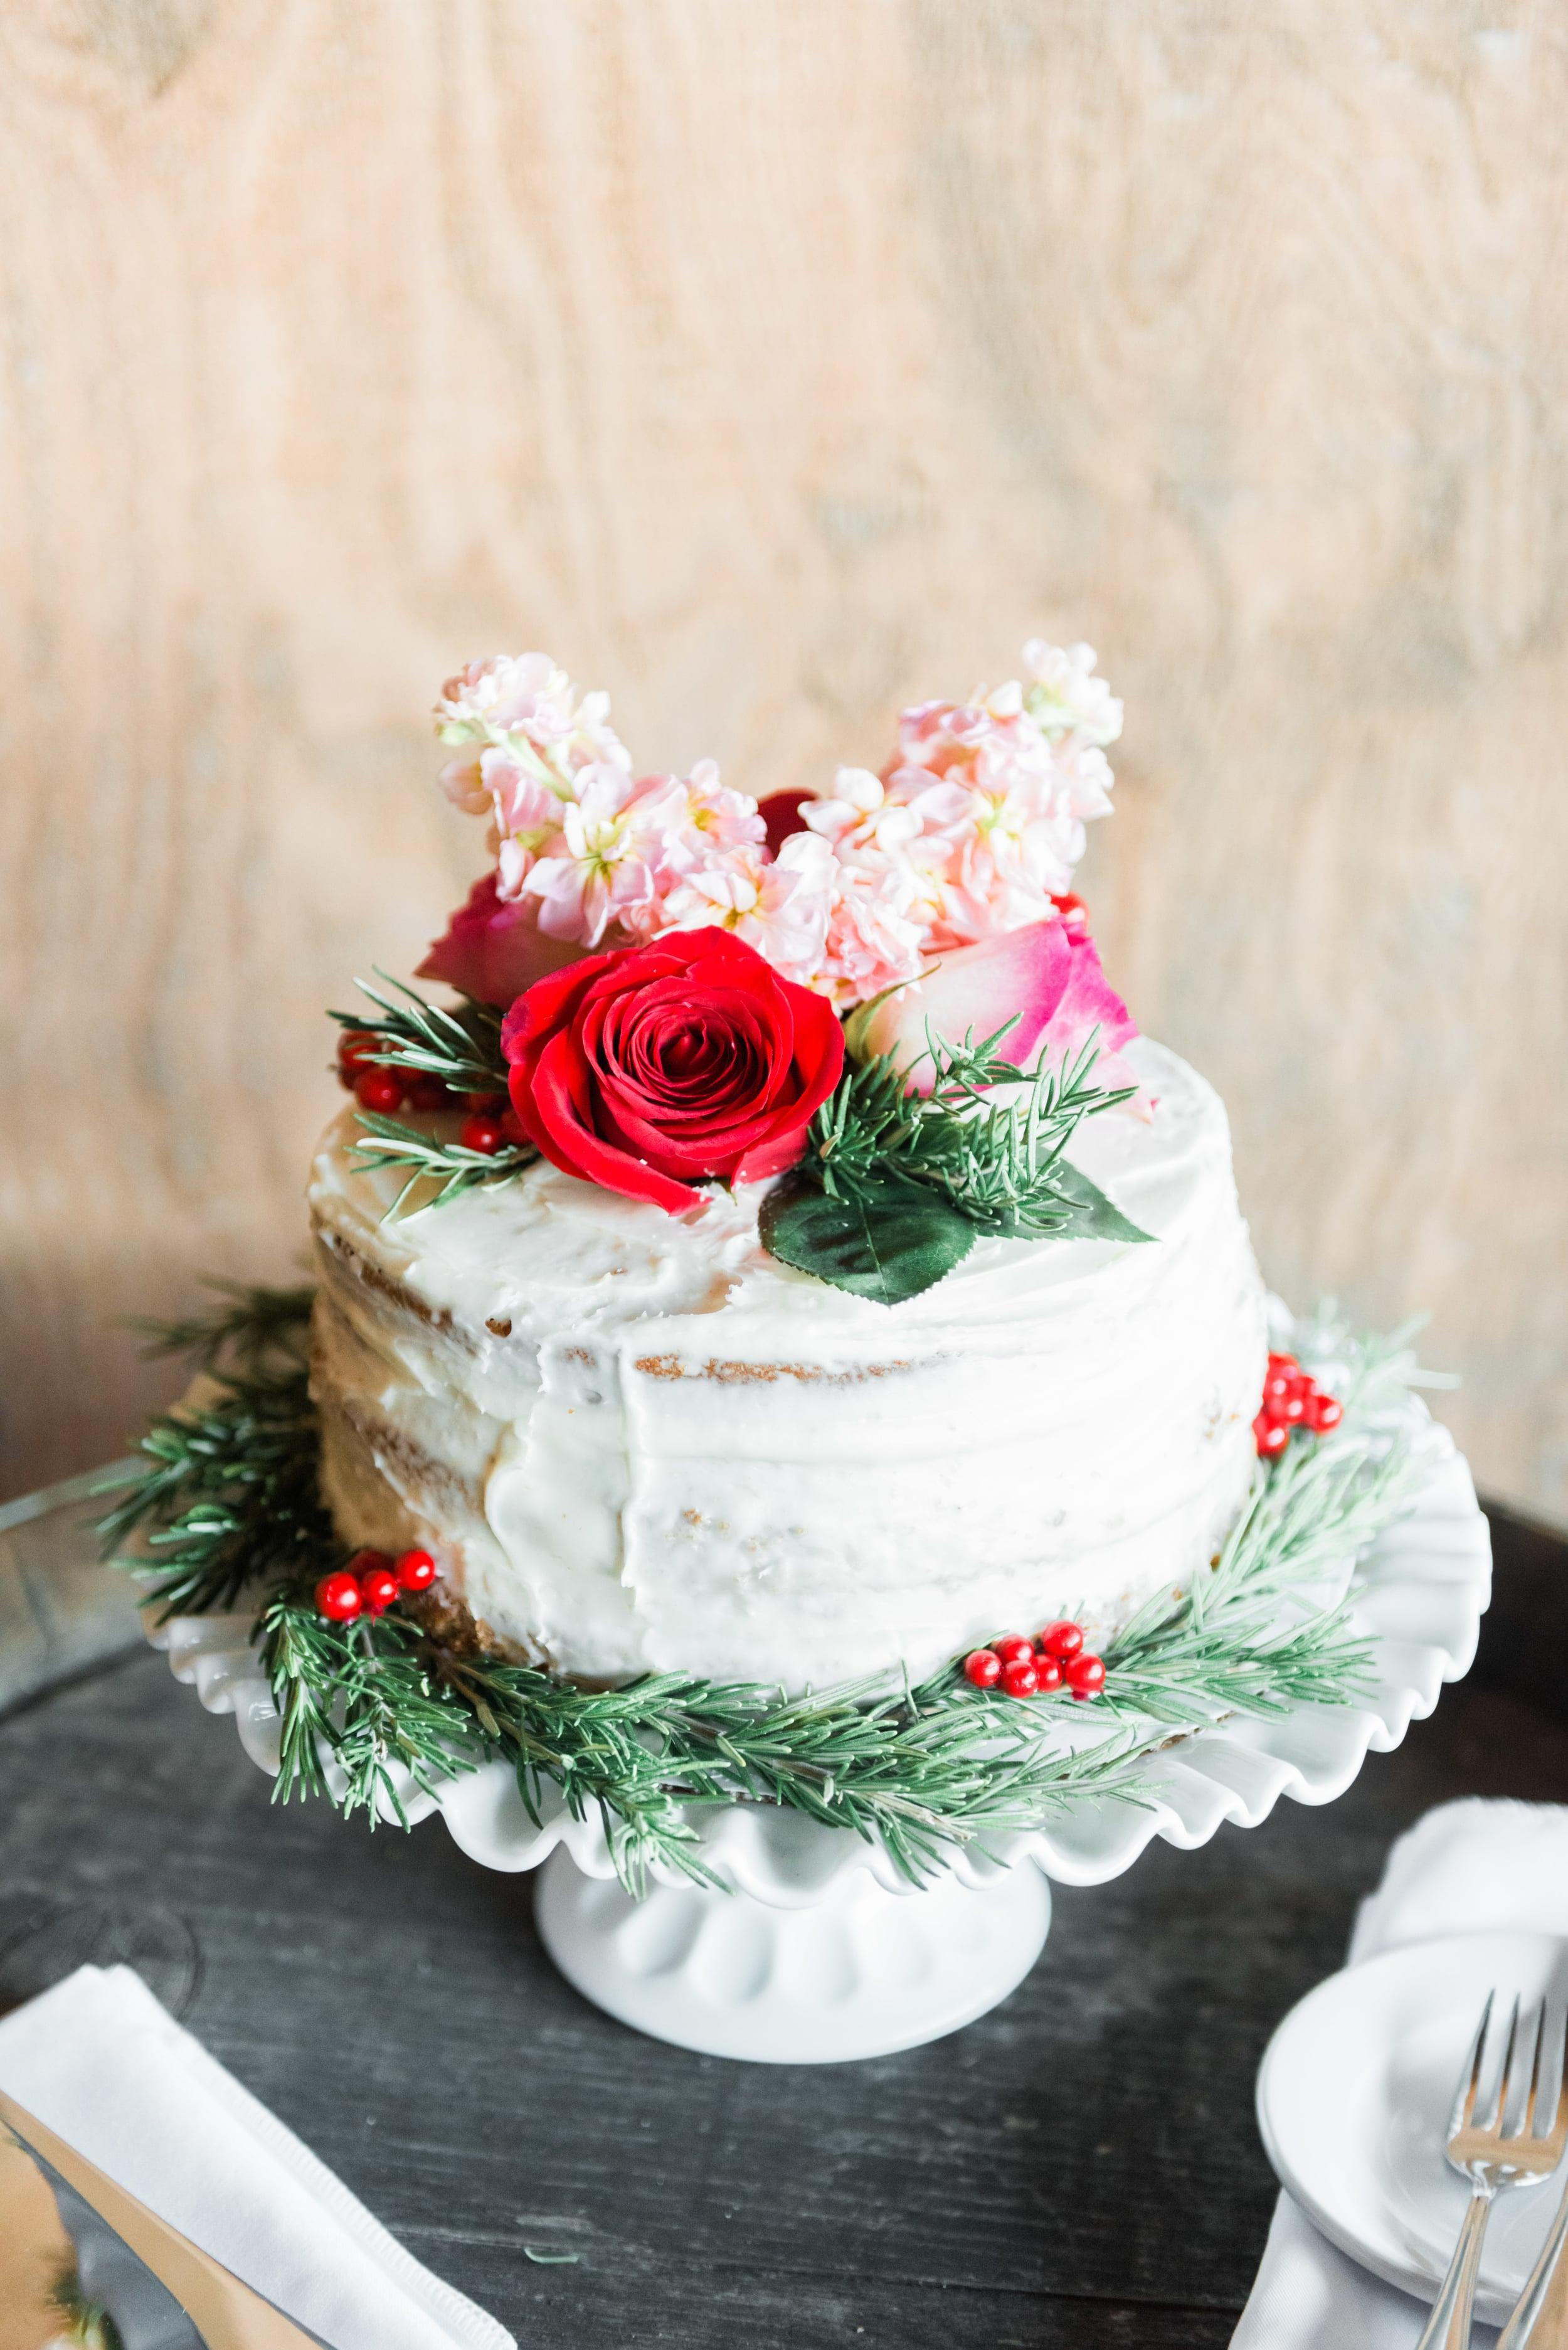 Natalie_Schutt_Photography_Winter_Wedding_San_Luis_Obispo-79.jpg